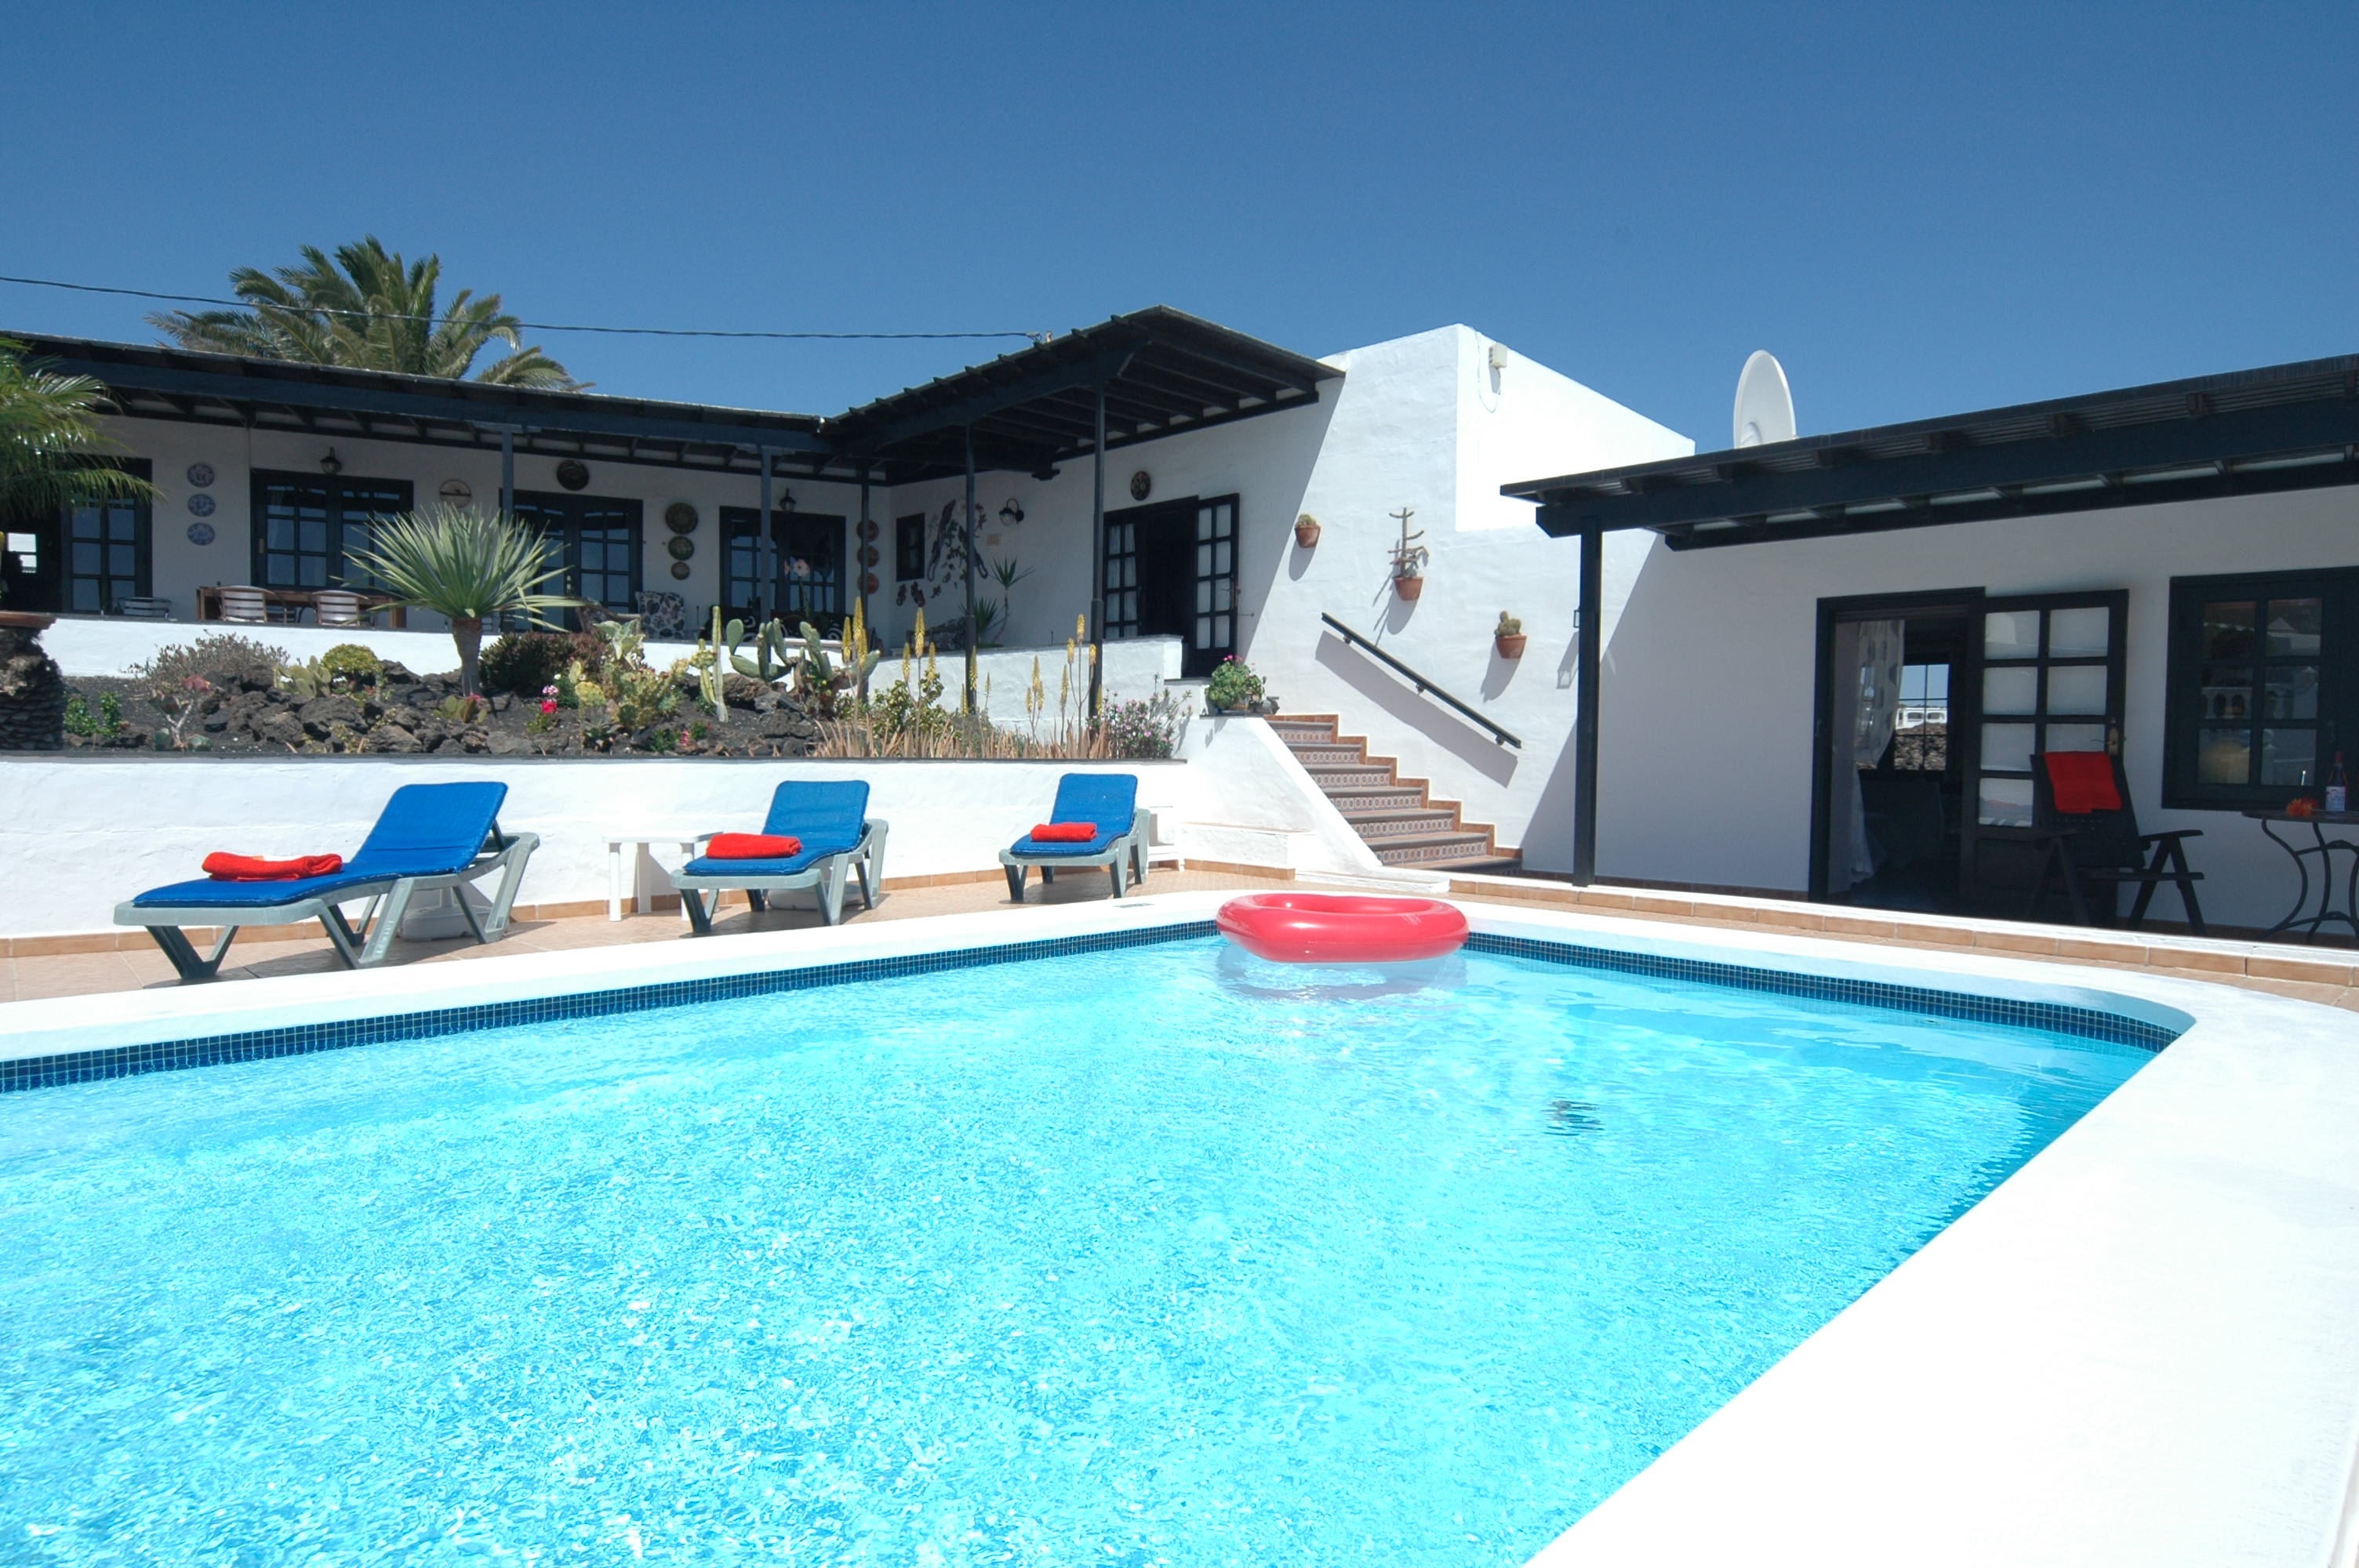 LVC198622 Villa and pool